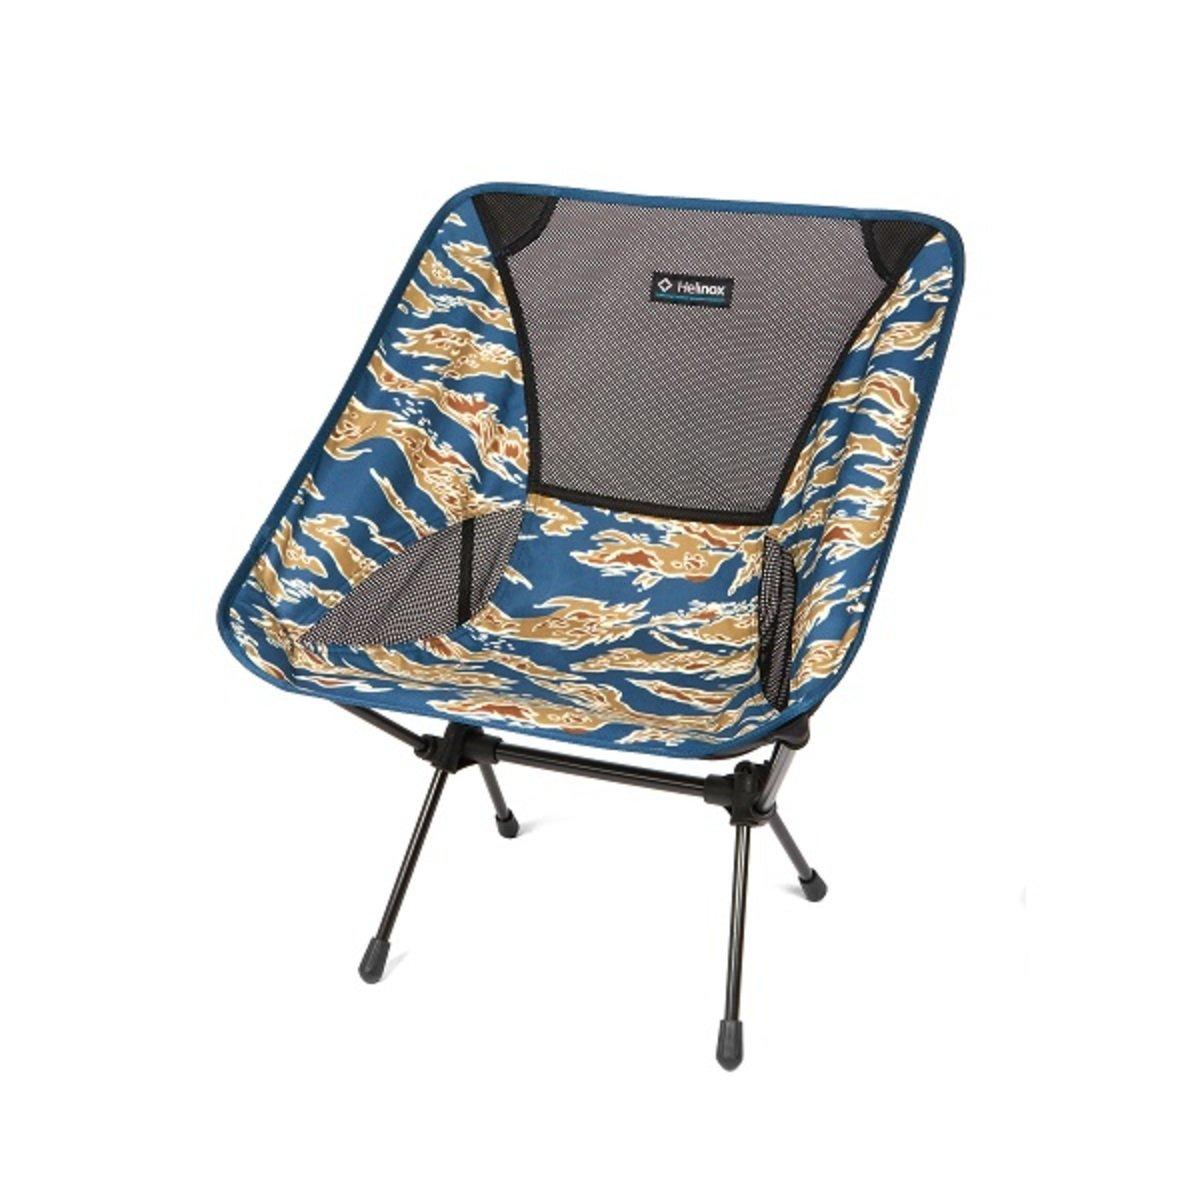 Chair One-Tiger Stripe Camo